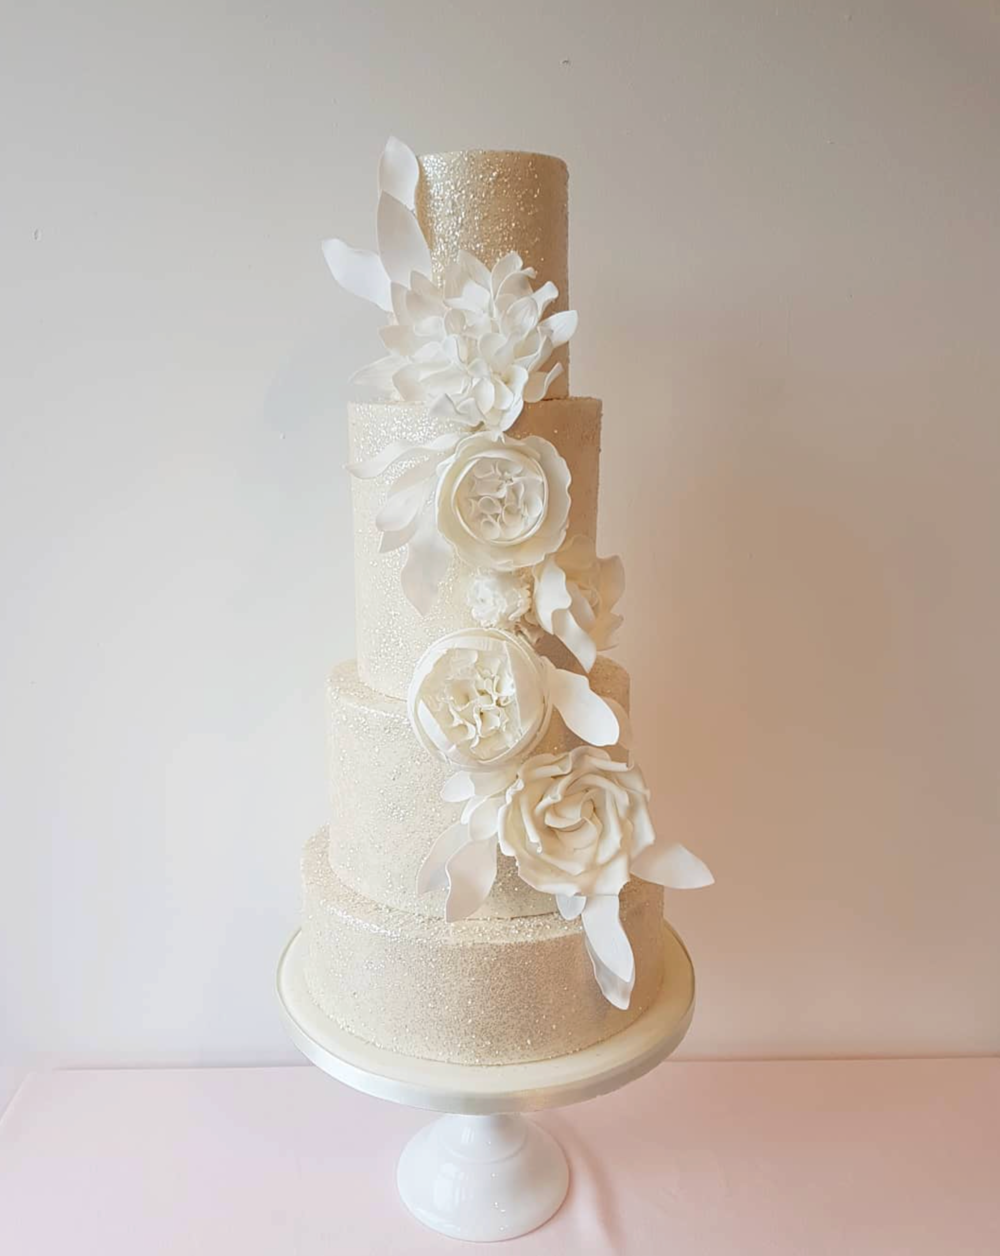 DOTTY ROSE CAKE DESIGN WHITE FLORAL WEDDING CAKE.png